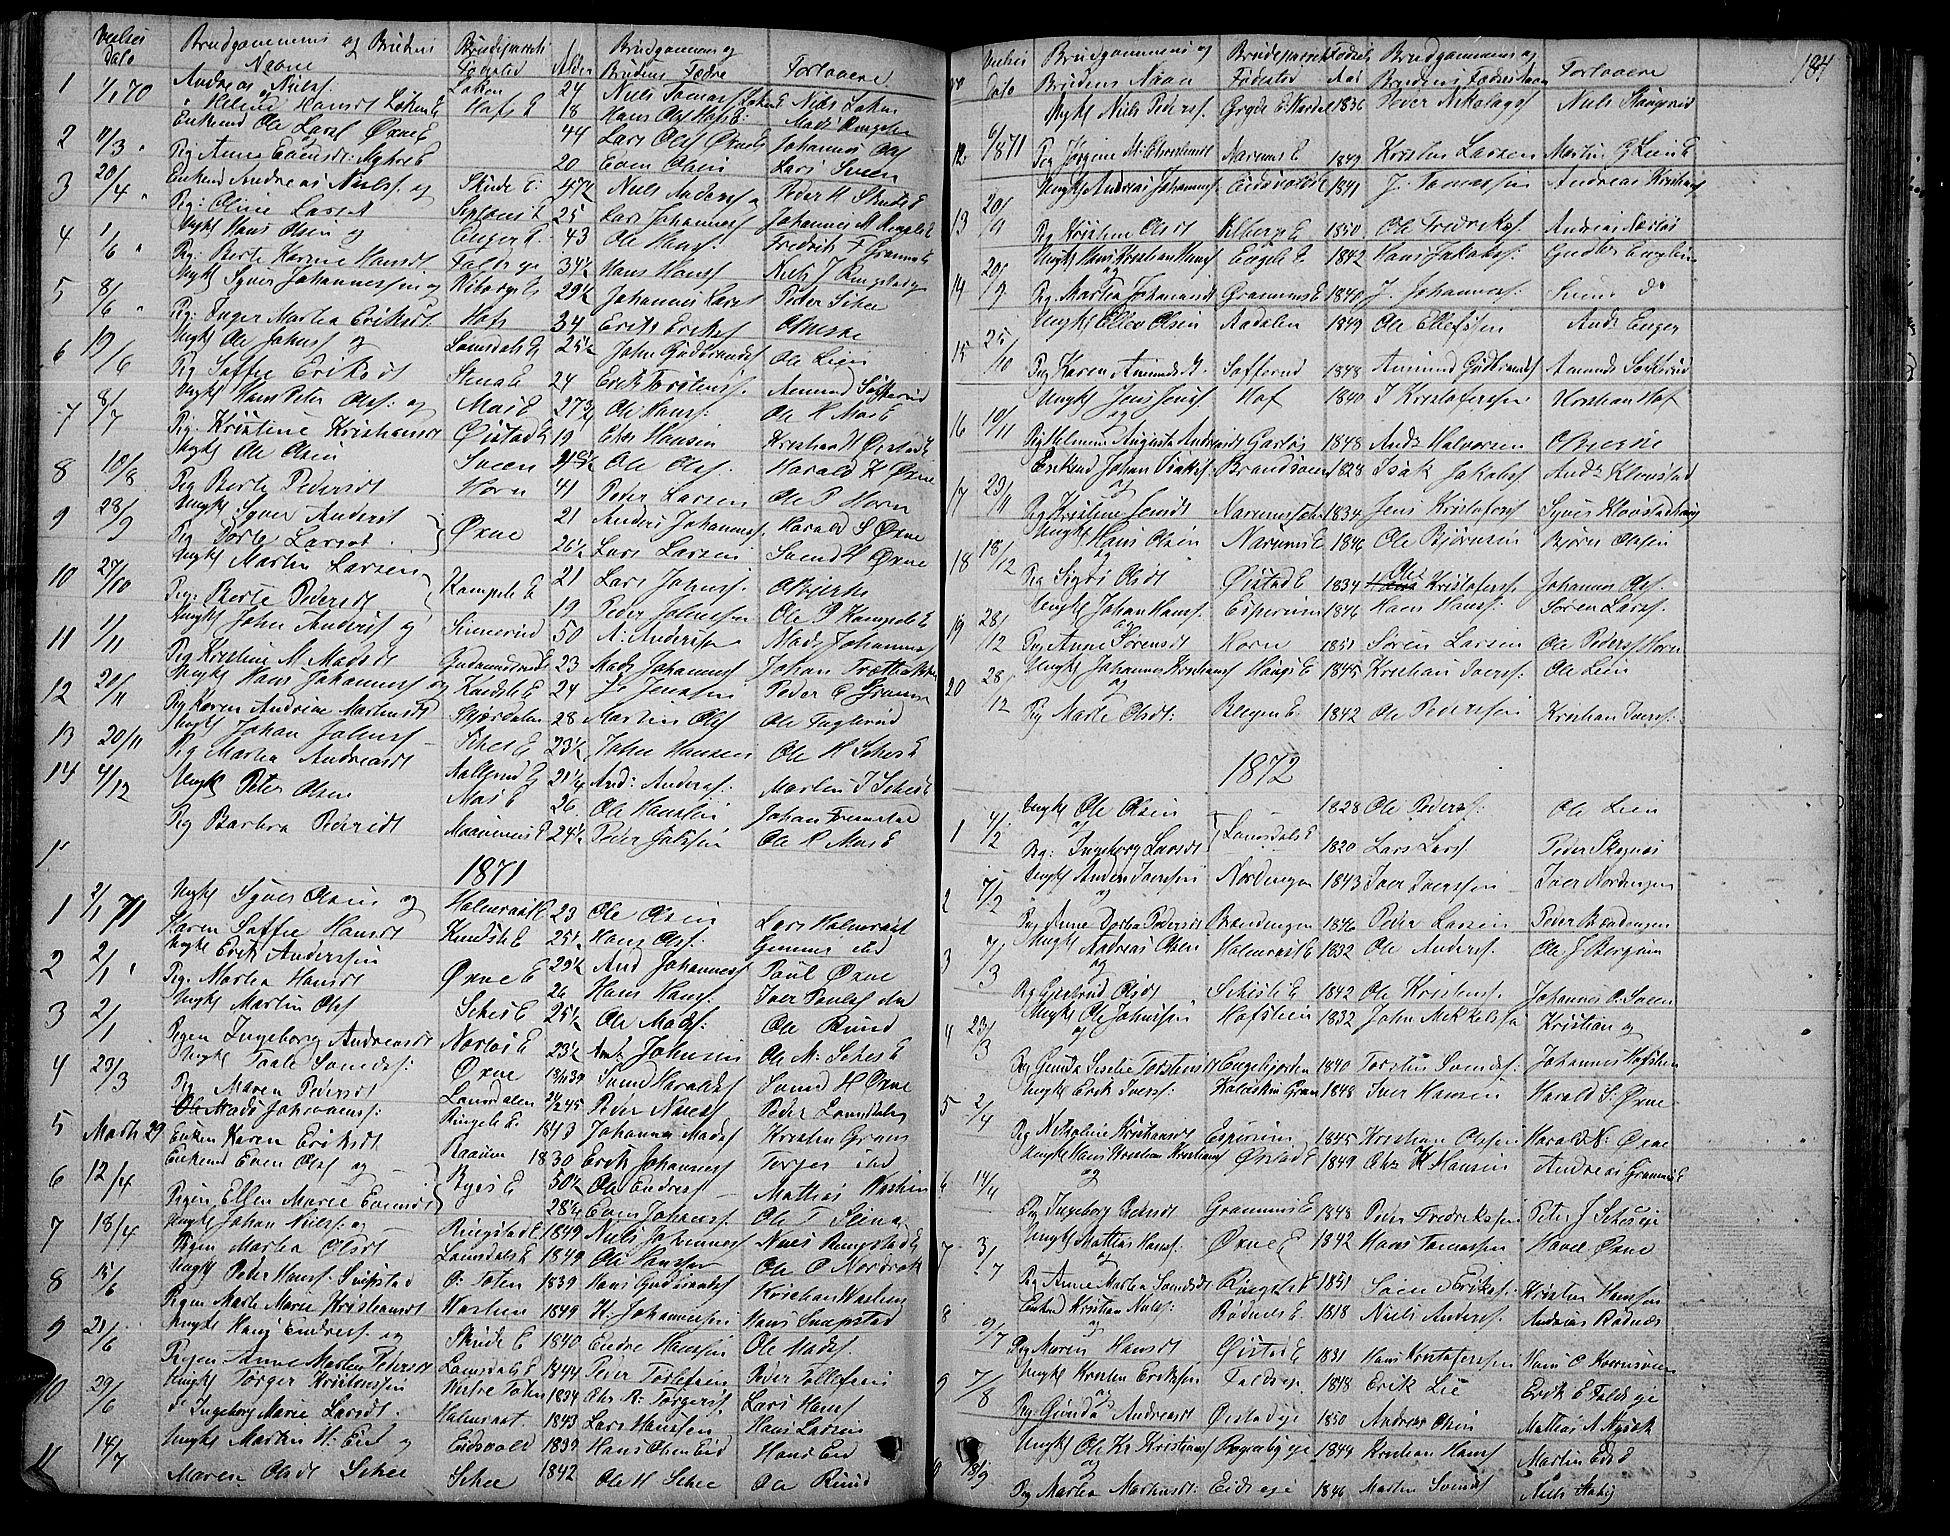 SAH, Søndre Land prestekontor, L/L0001: Klokkerbok nr. 1, 1849-1883, s. 184